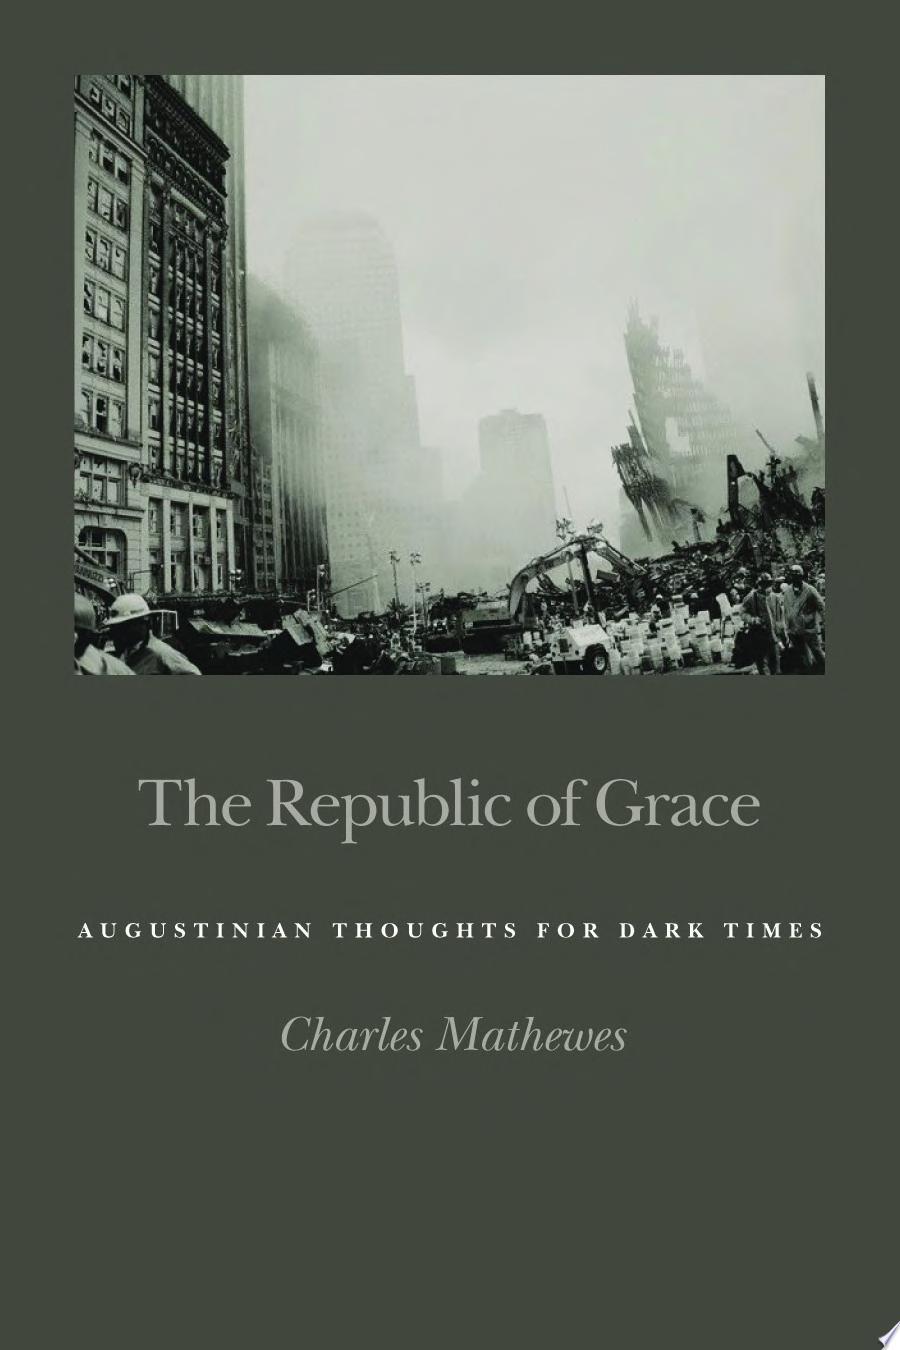 The Republic of Grace